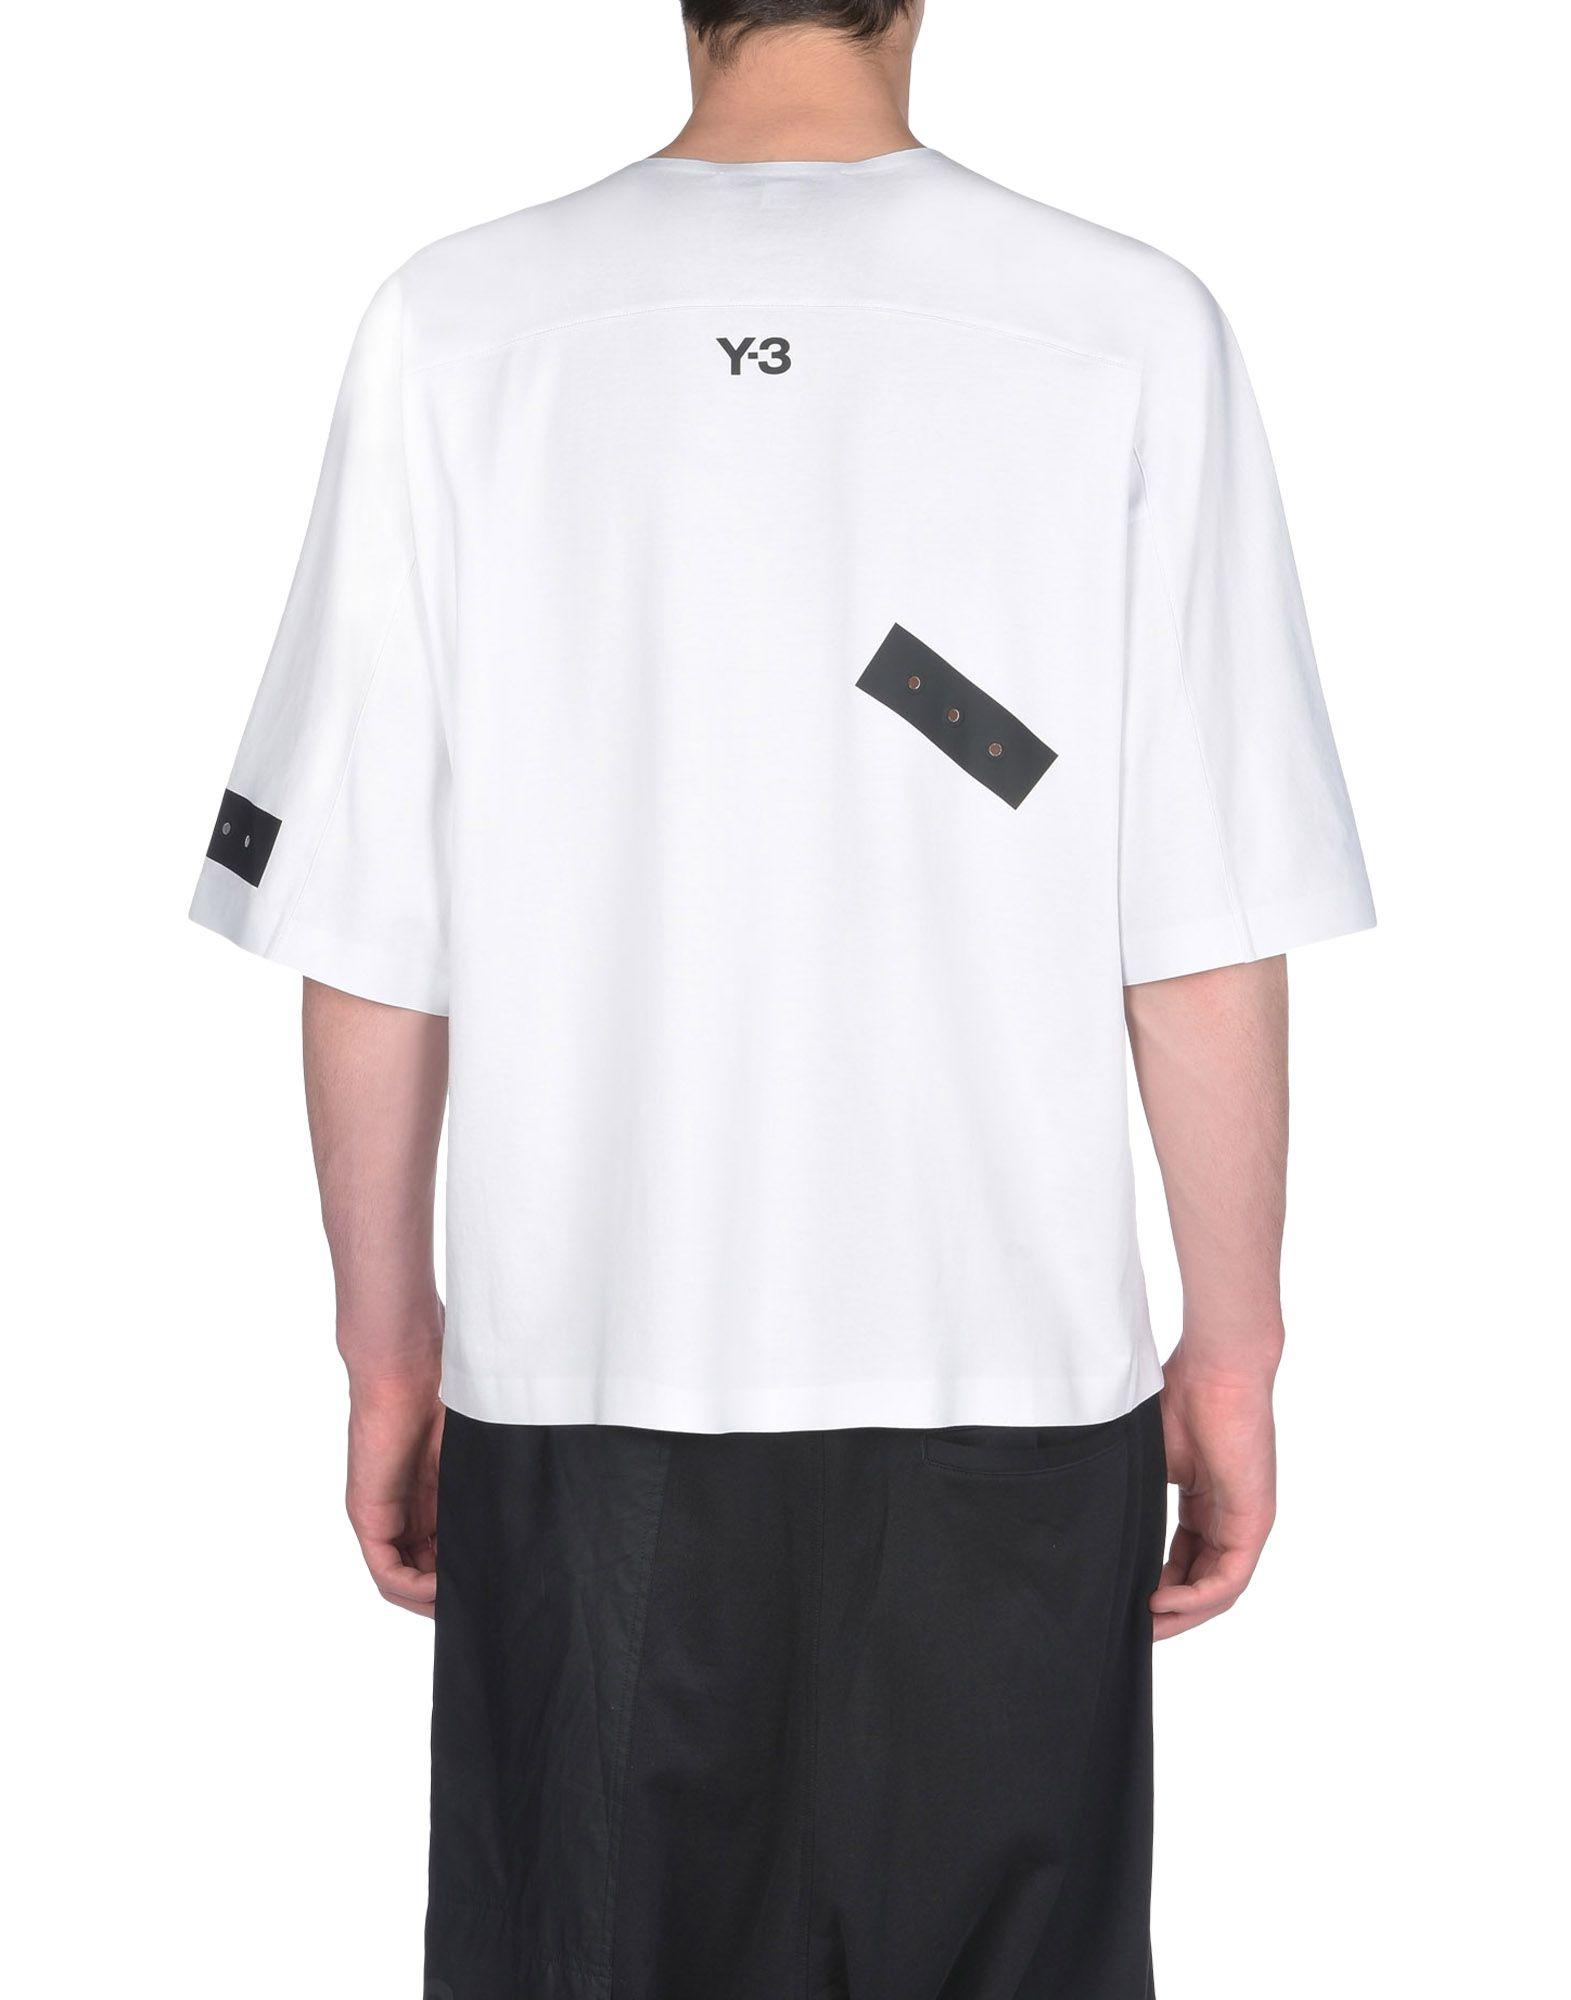 Y-3 Y-3 SKYLIGHT TEE T シャツ メンズ e